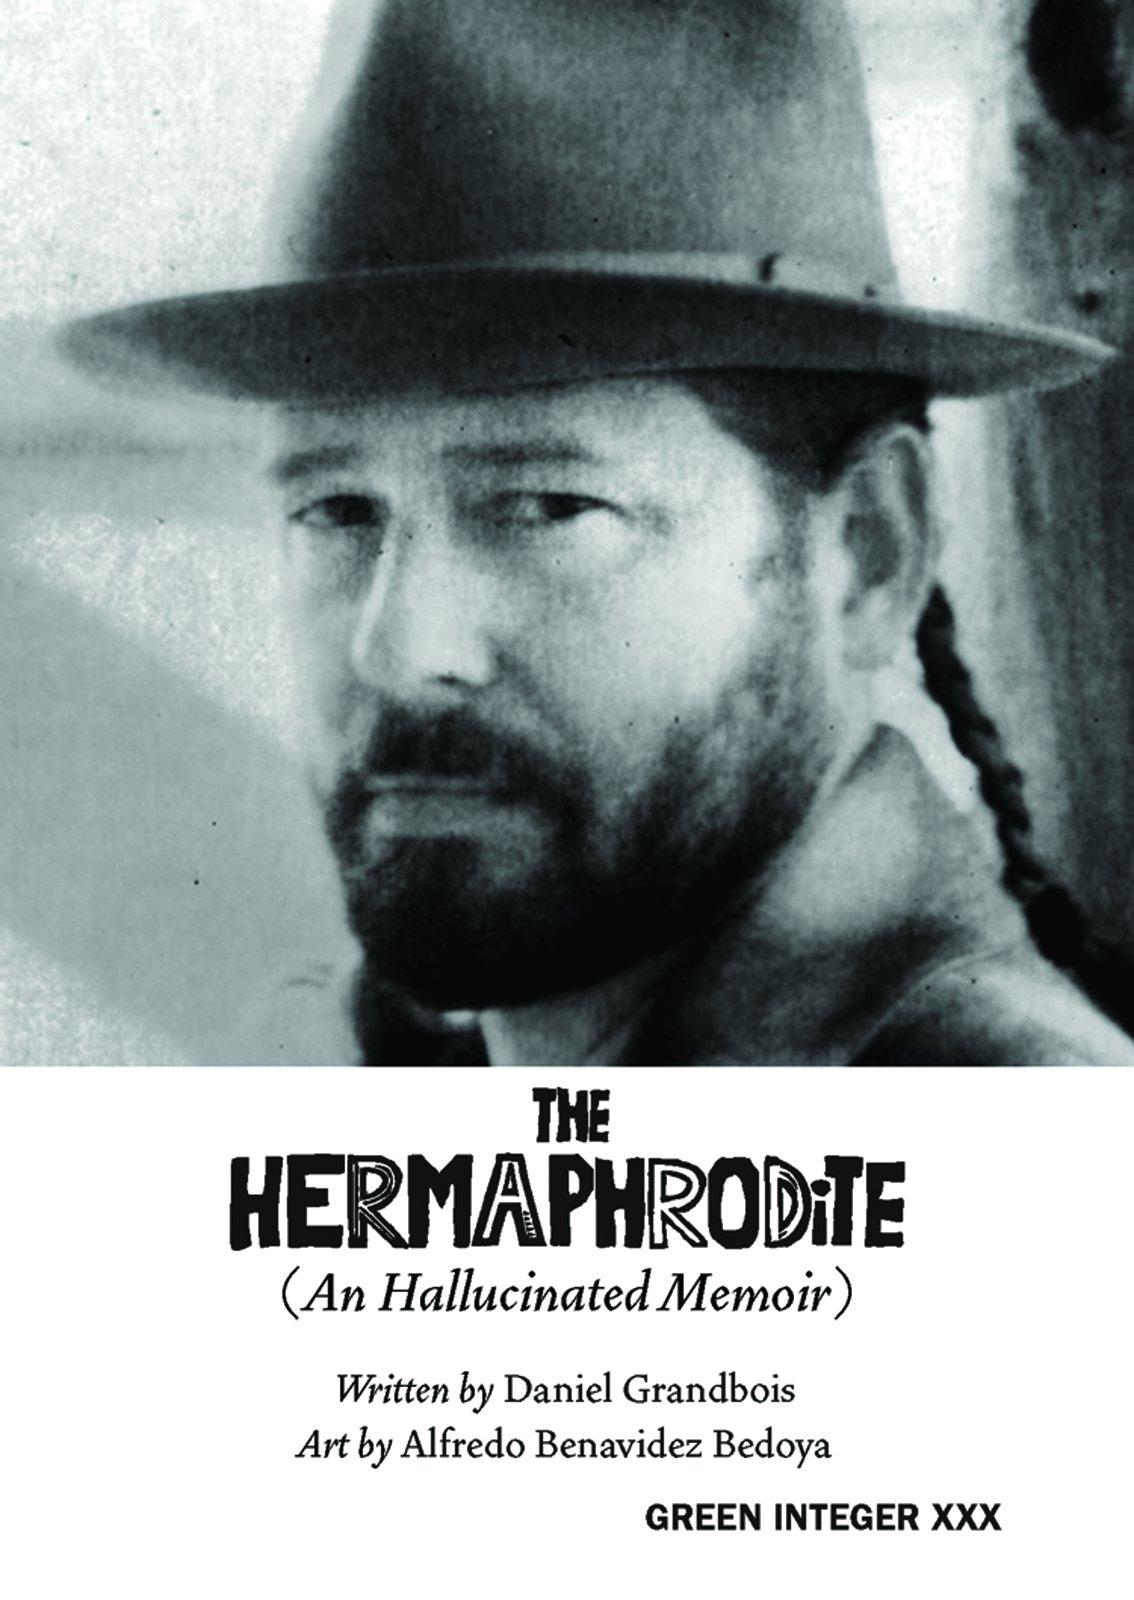 The Hermaphrodite: An Hallucinated Memoir (Green Integer) PDF